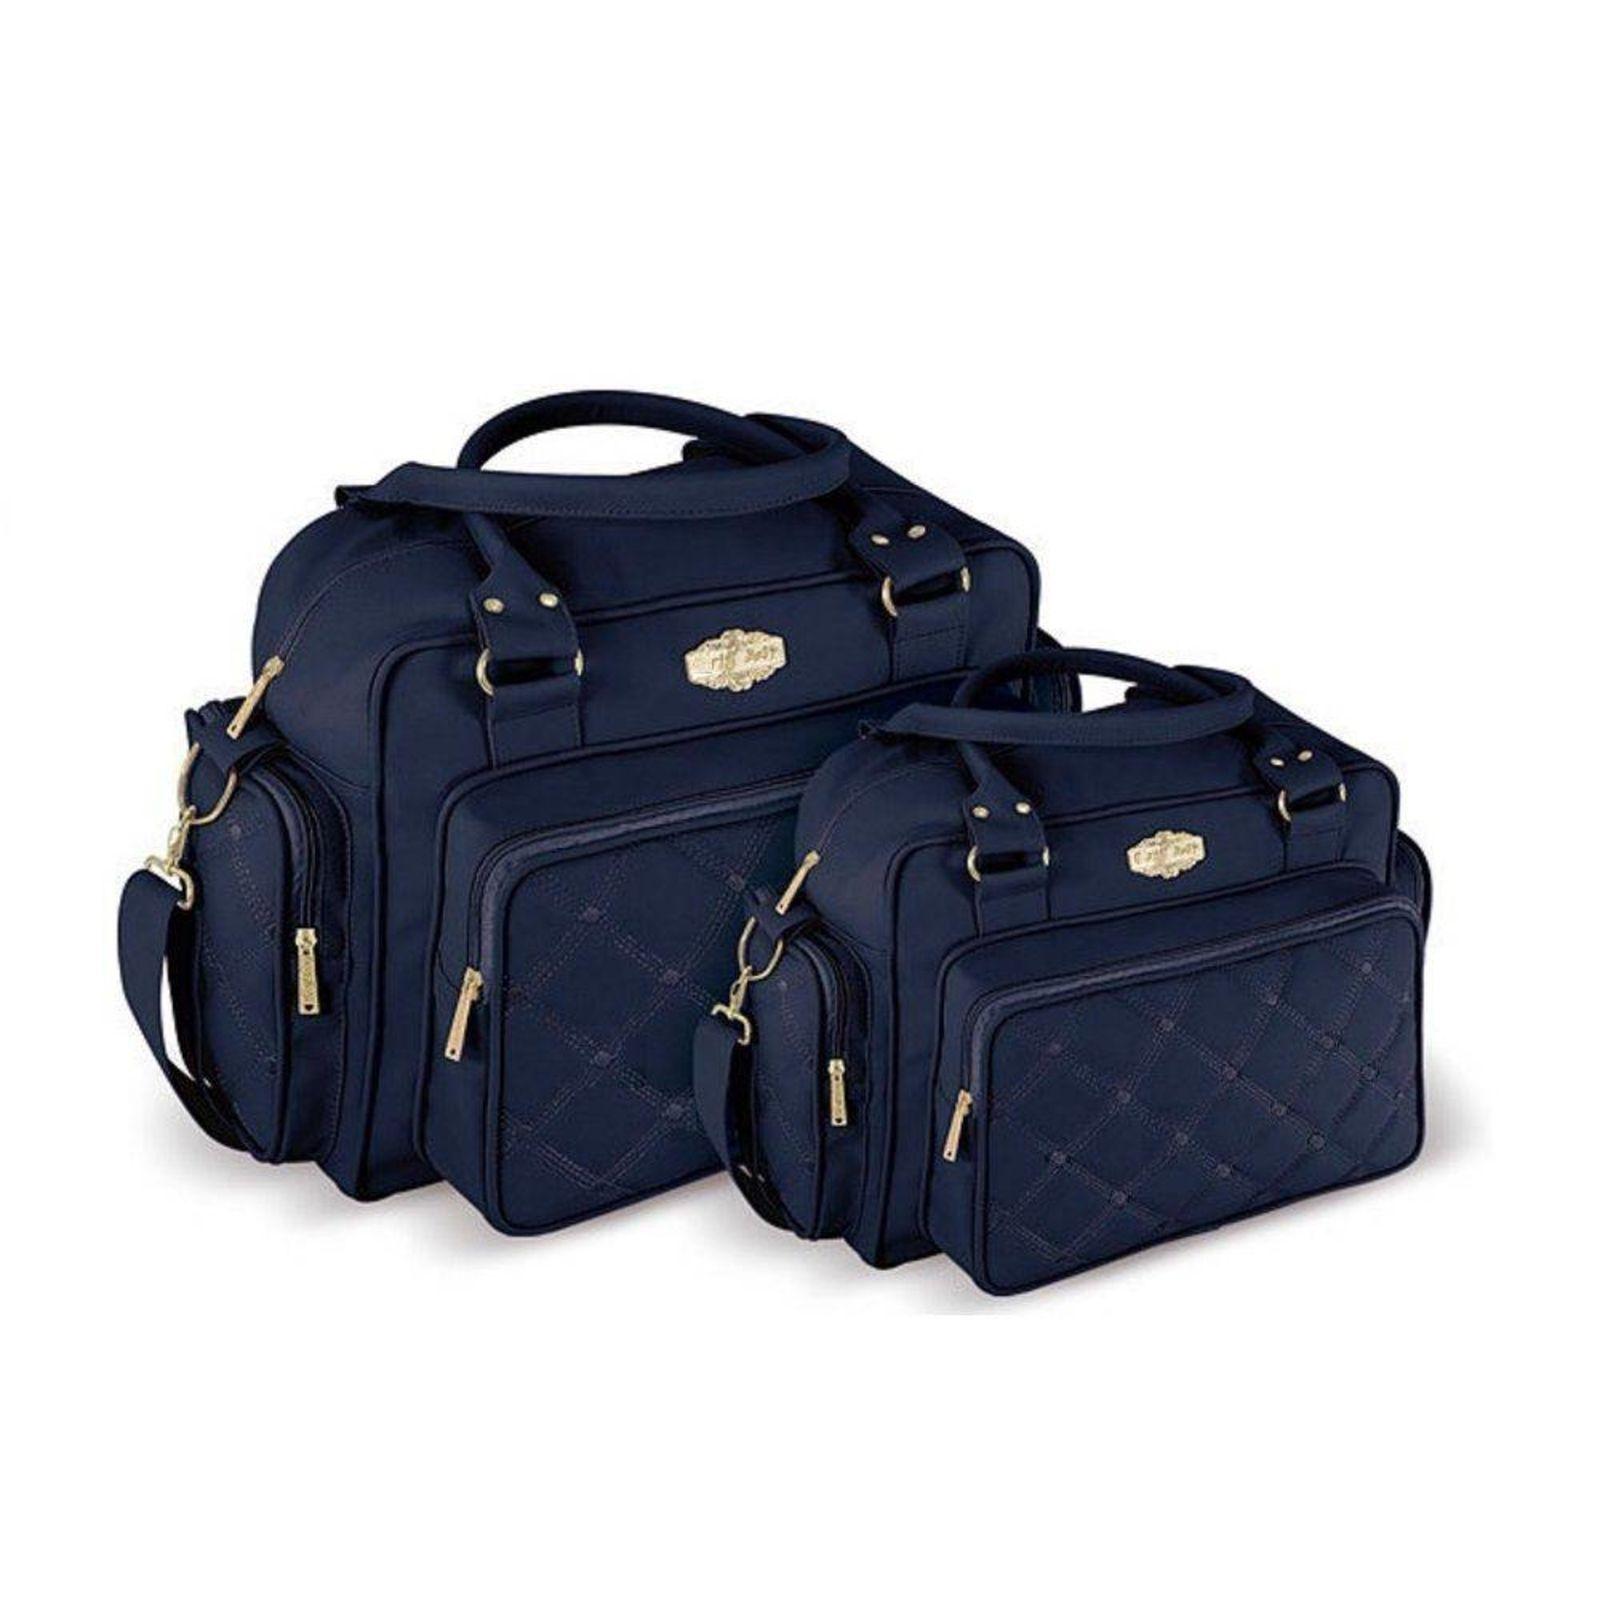 Kit Bolsa grande e mochila maternidade personalizado Menino